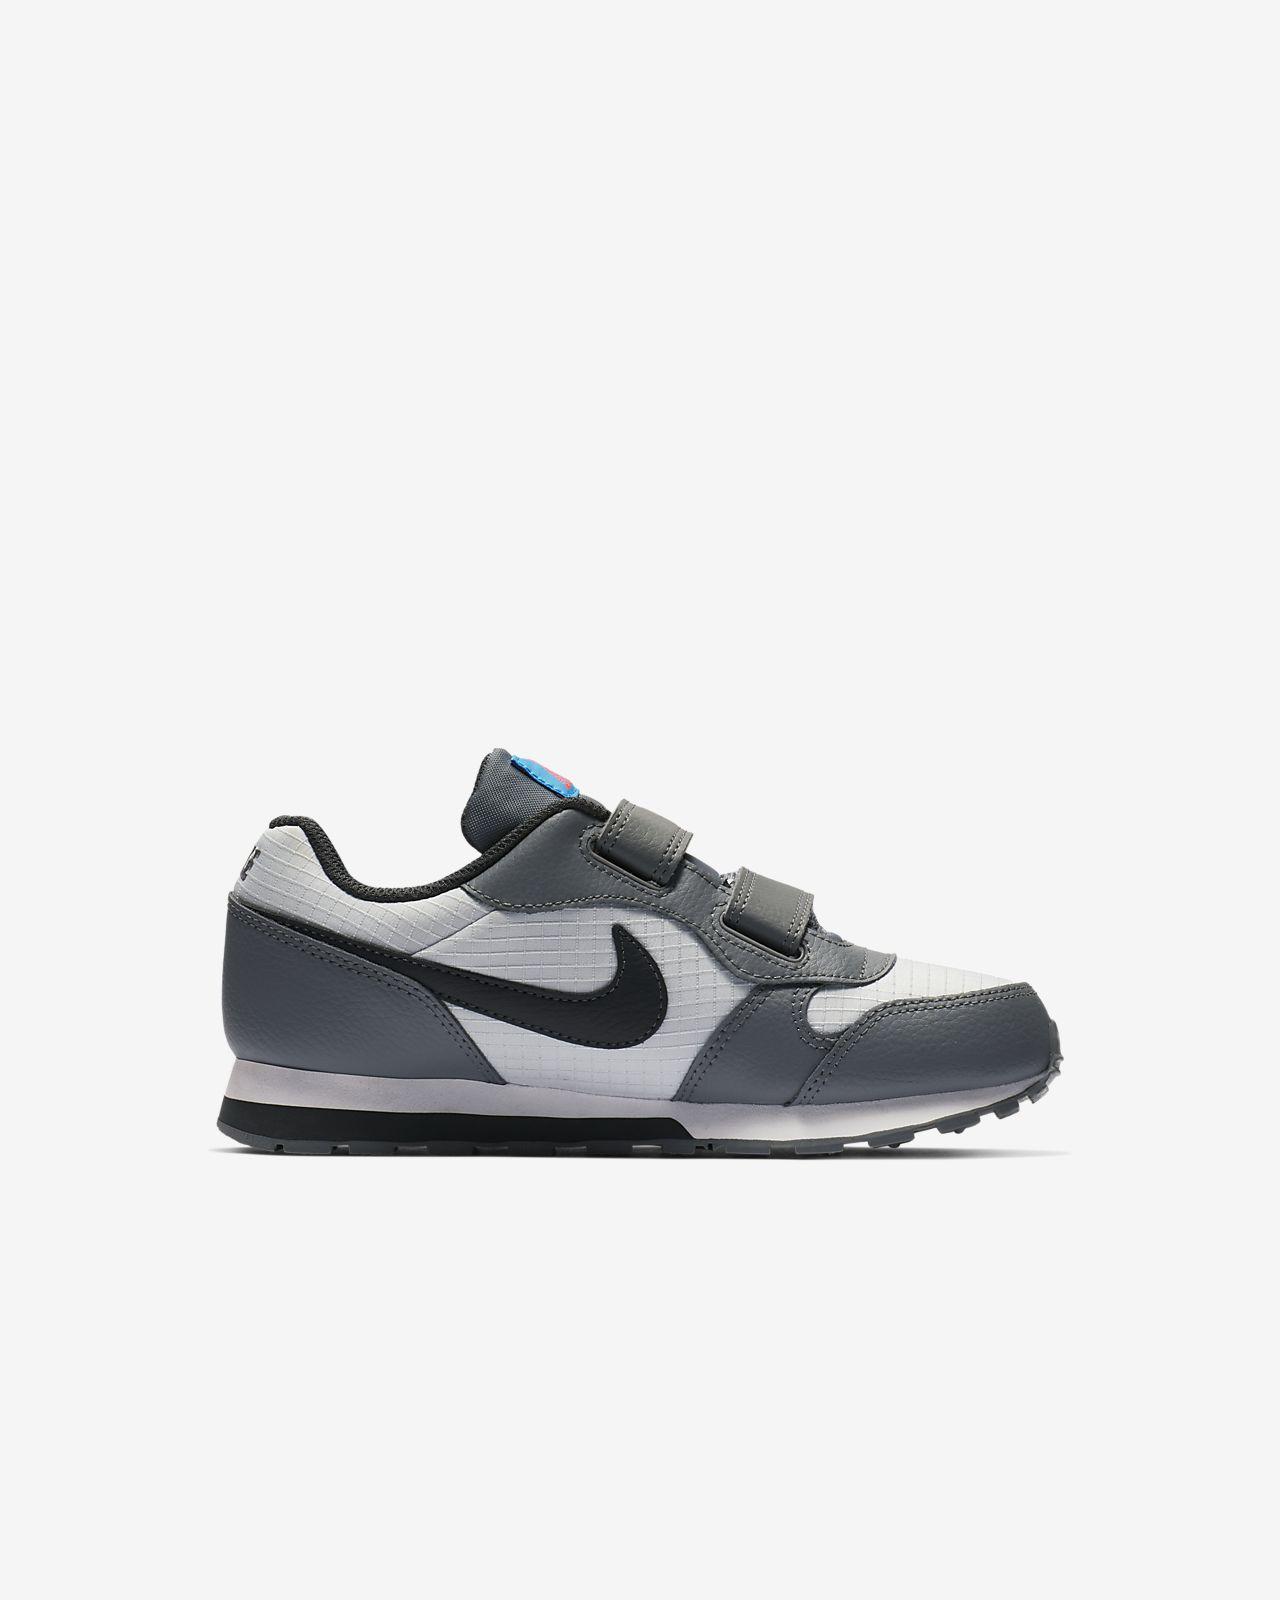 182c0651ee0377 Nike MD Runner 2 Younger Kids  Shoe. Nike.com AU